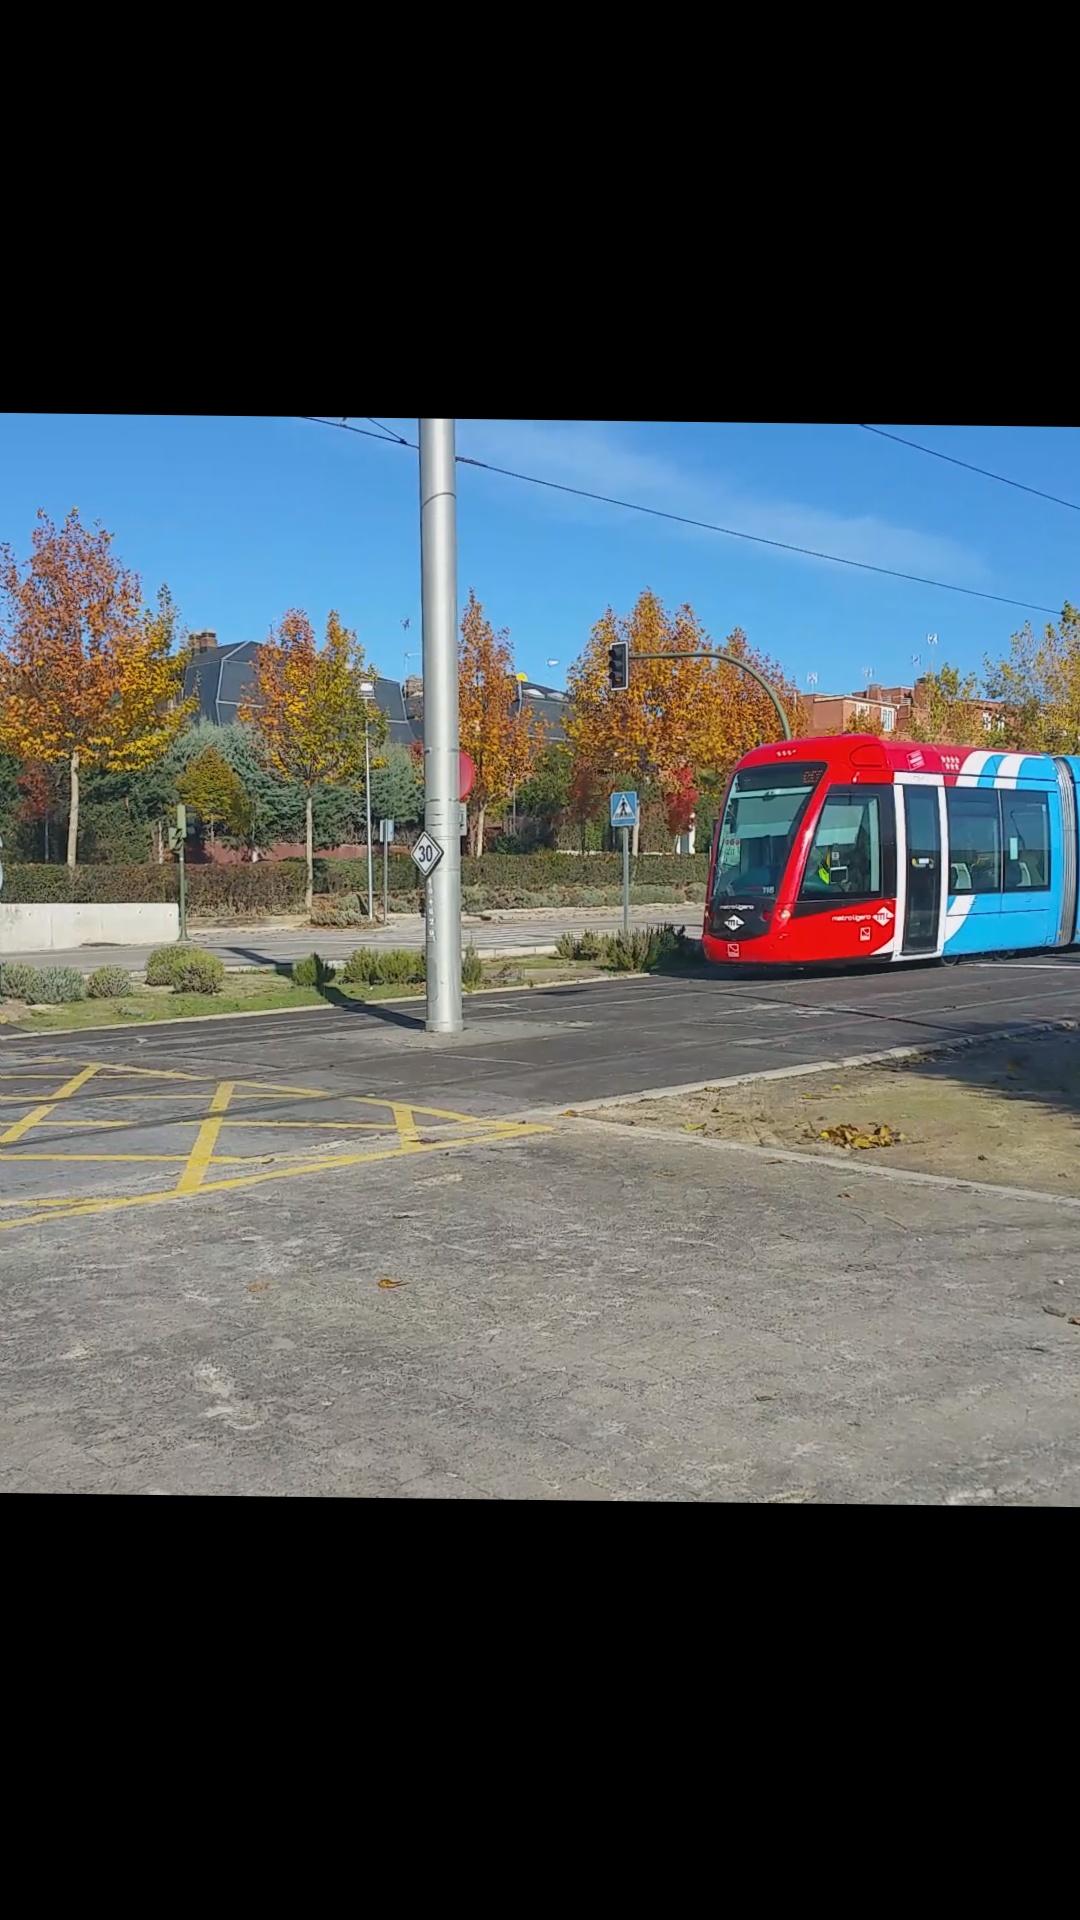 Accidente de un tren de metro ligero con un coche for Metro ligero colonia jardin